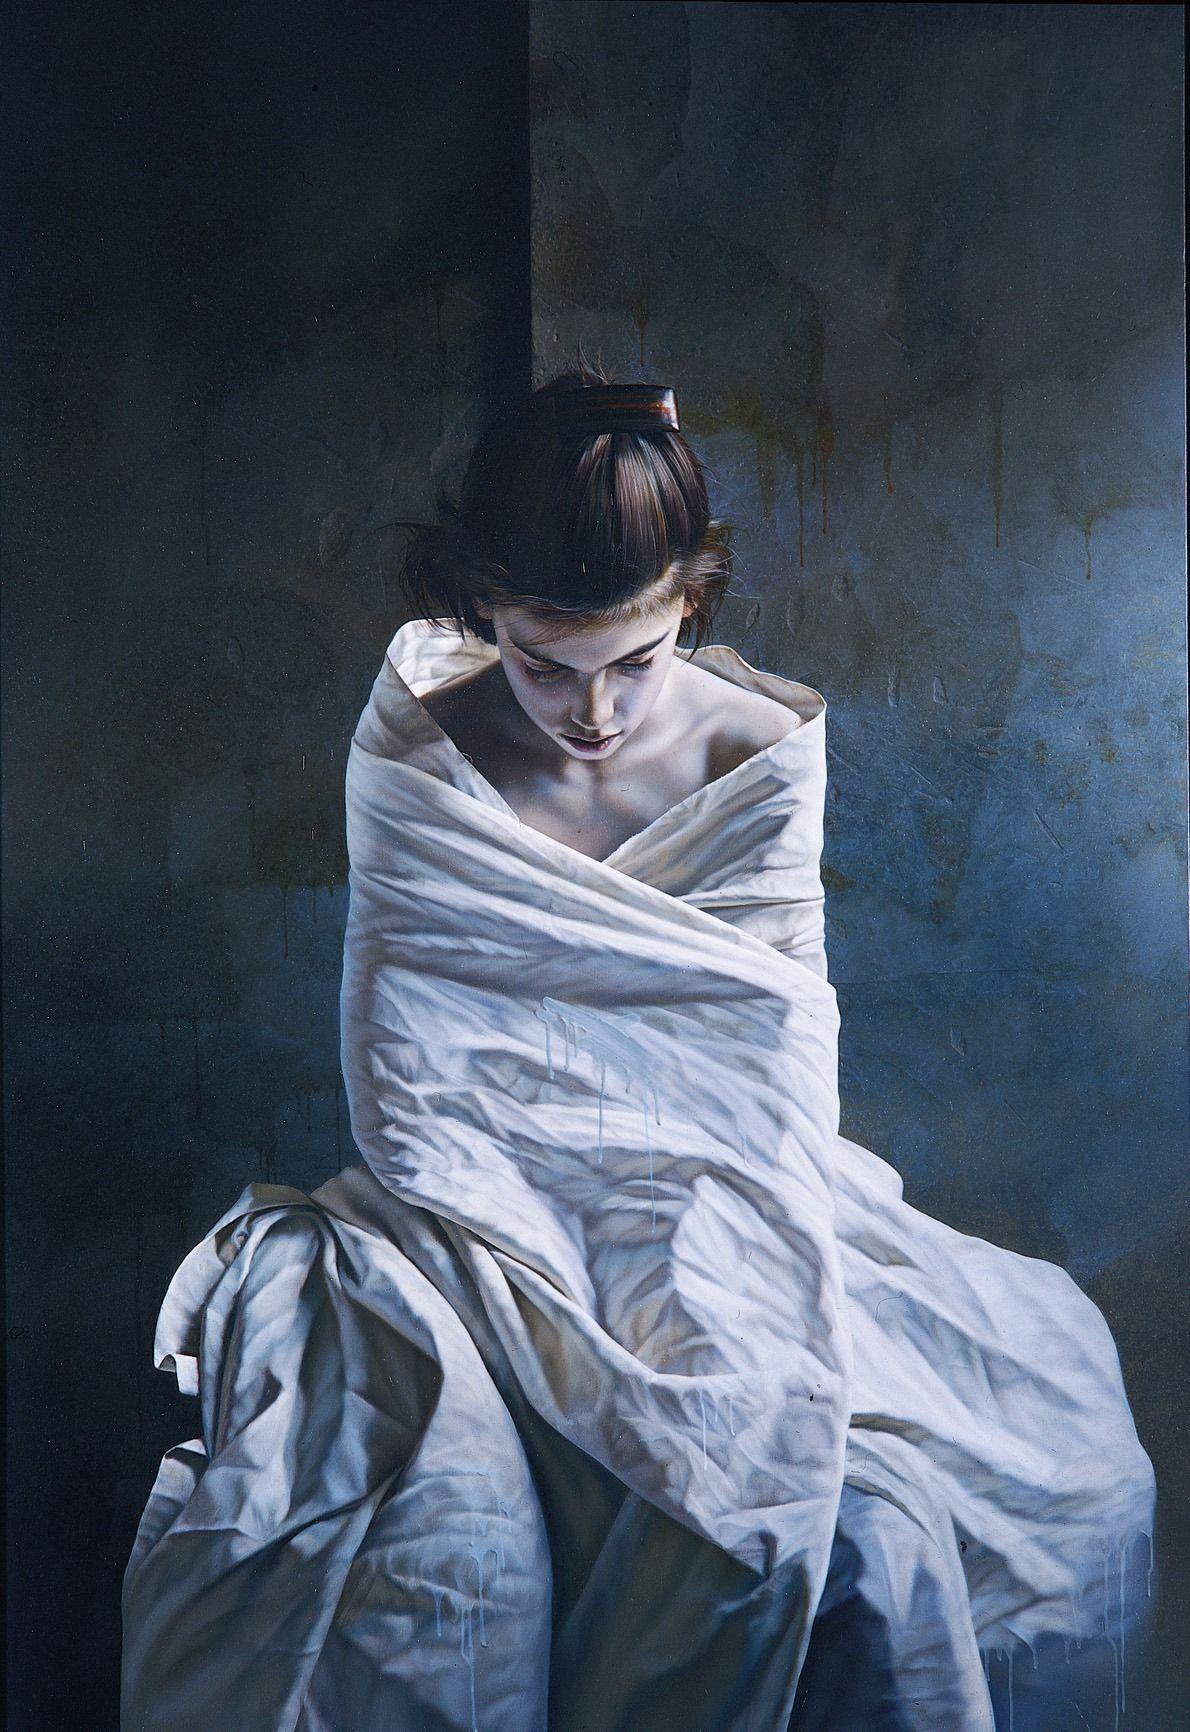 Istvan Sandorfi 1948 2007 Com Imagens Arte Do Corpo Feminino Hiper Realismo Retrato